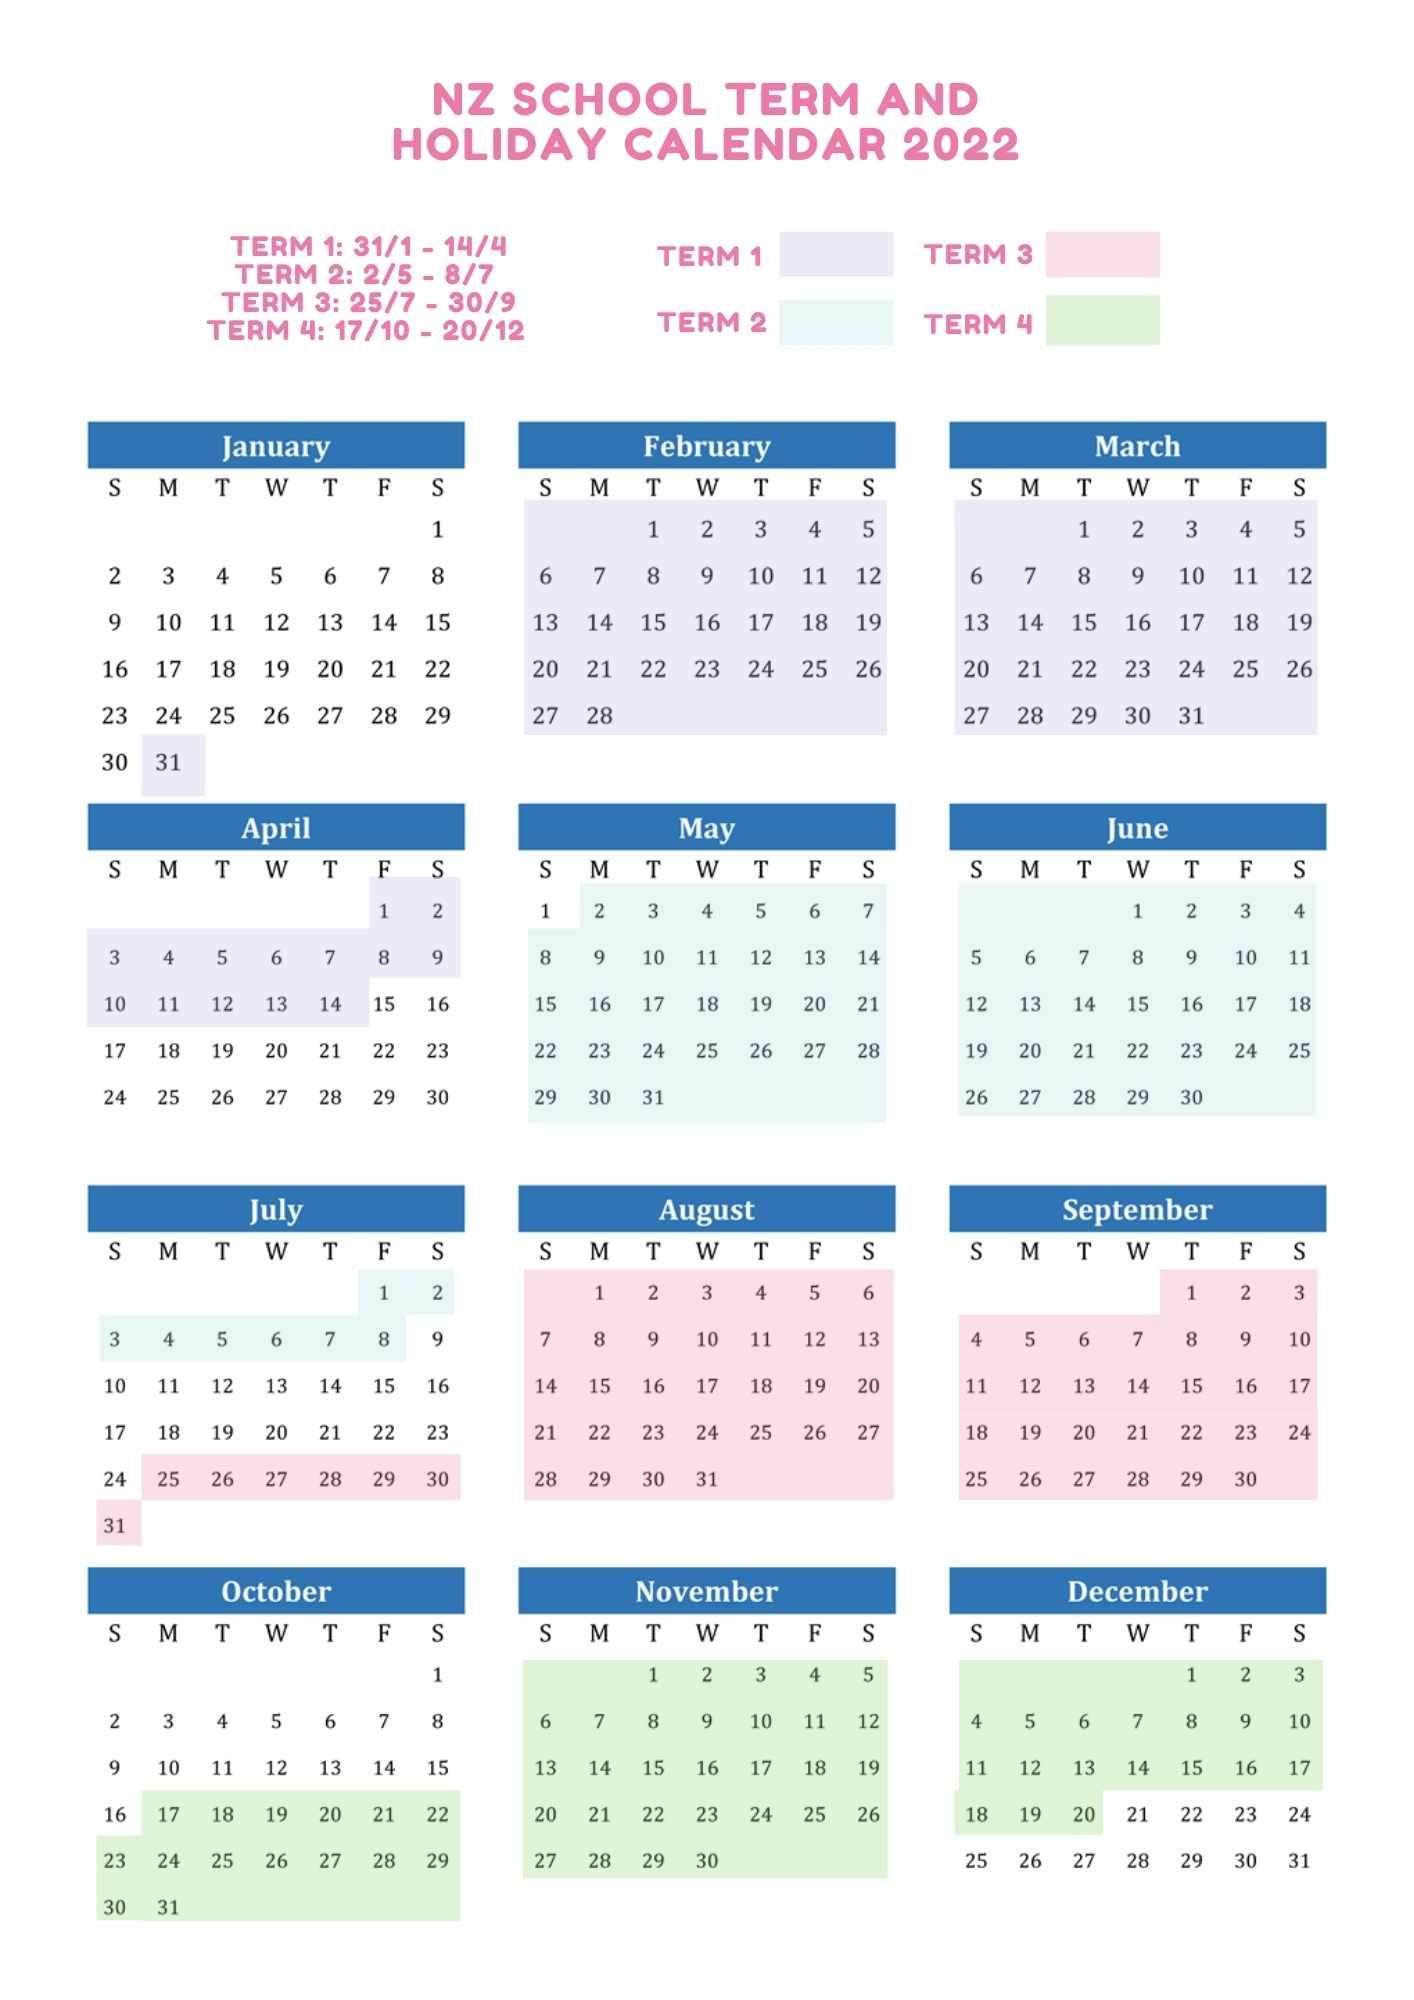 NZ school term and holiday calendar 2022